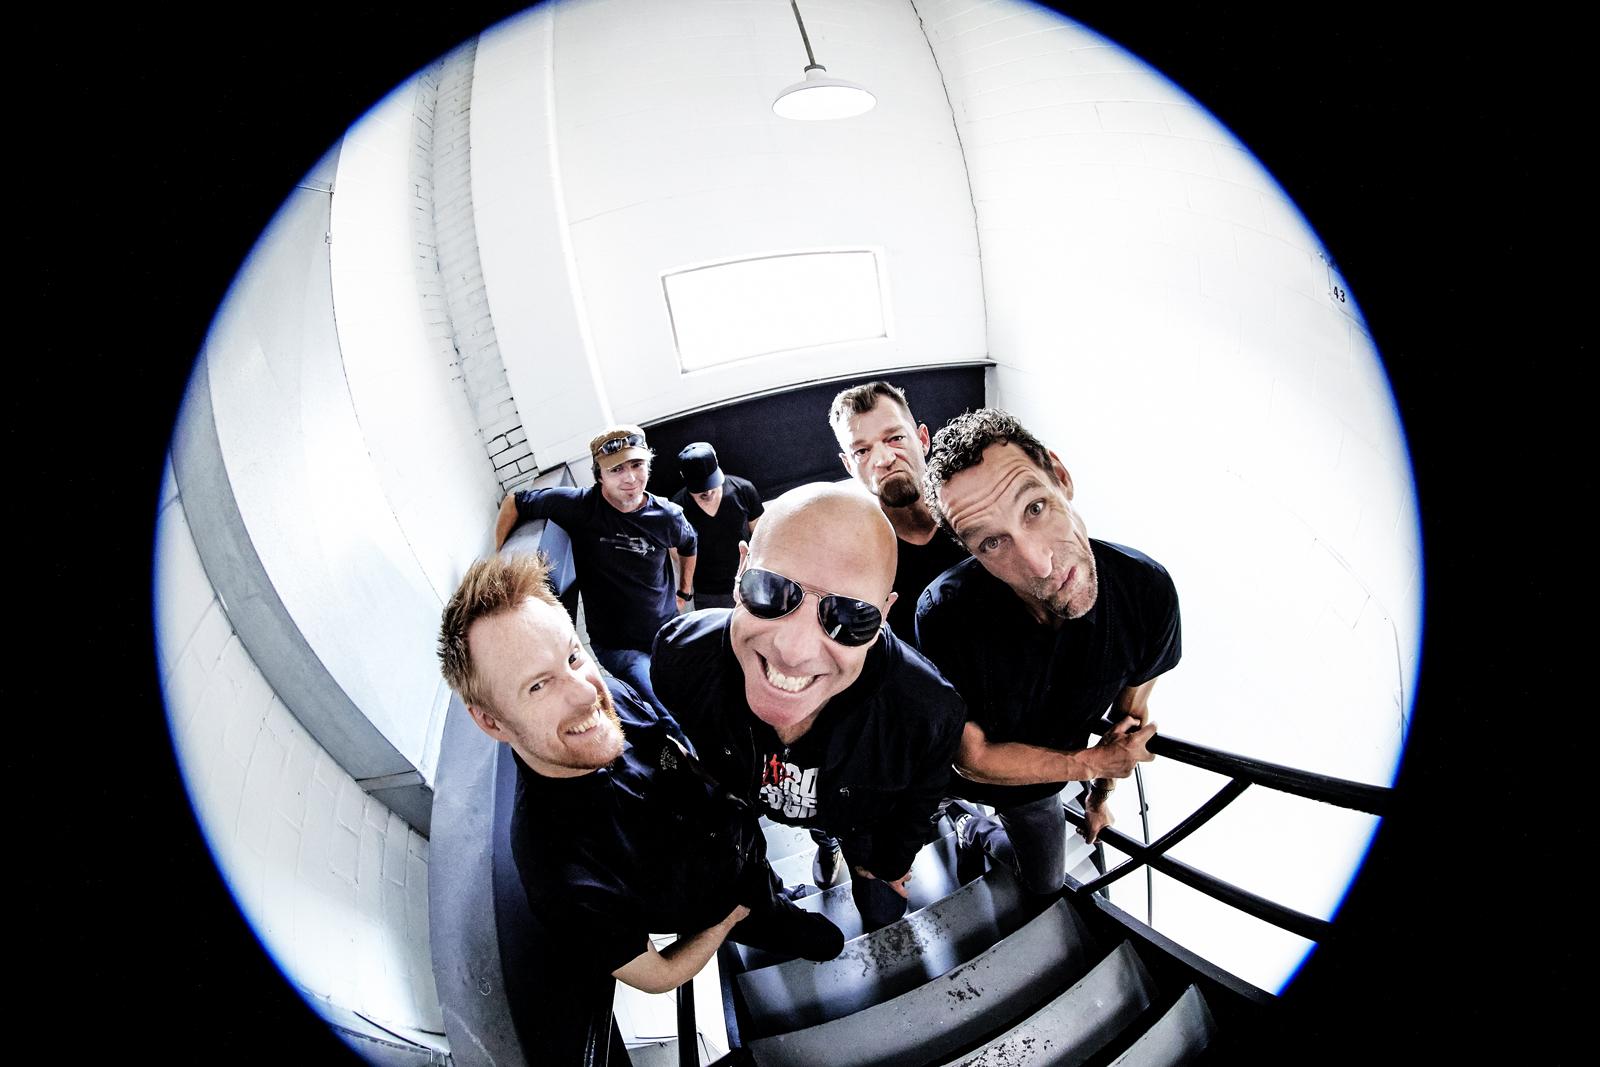 Canadian rockers Headstones will play Dec. 16 in Rapids Theatre, Niagara Falls.